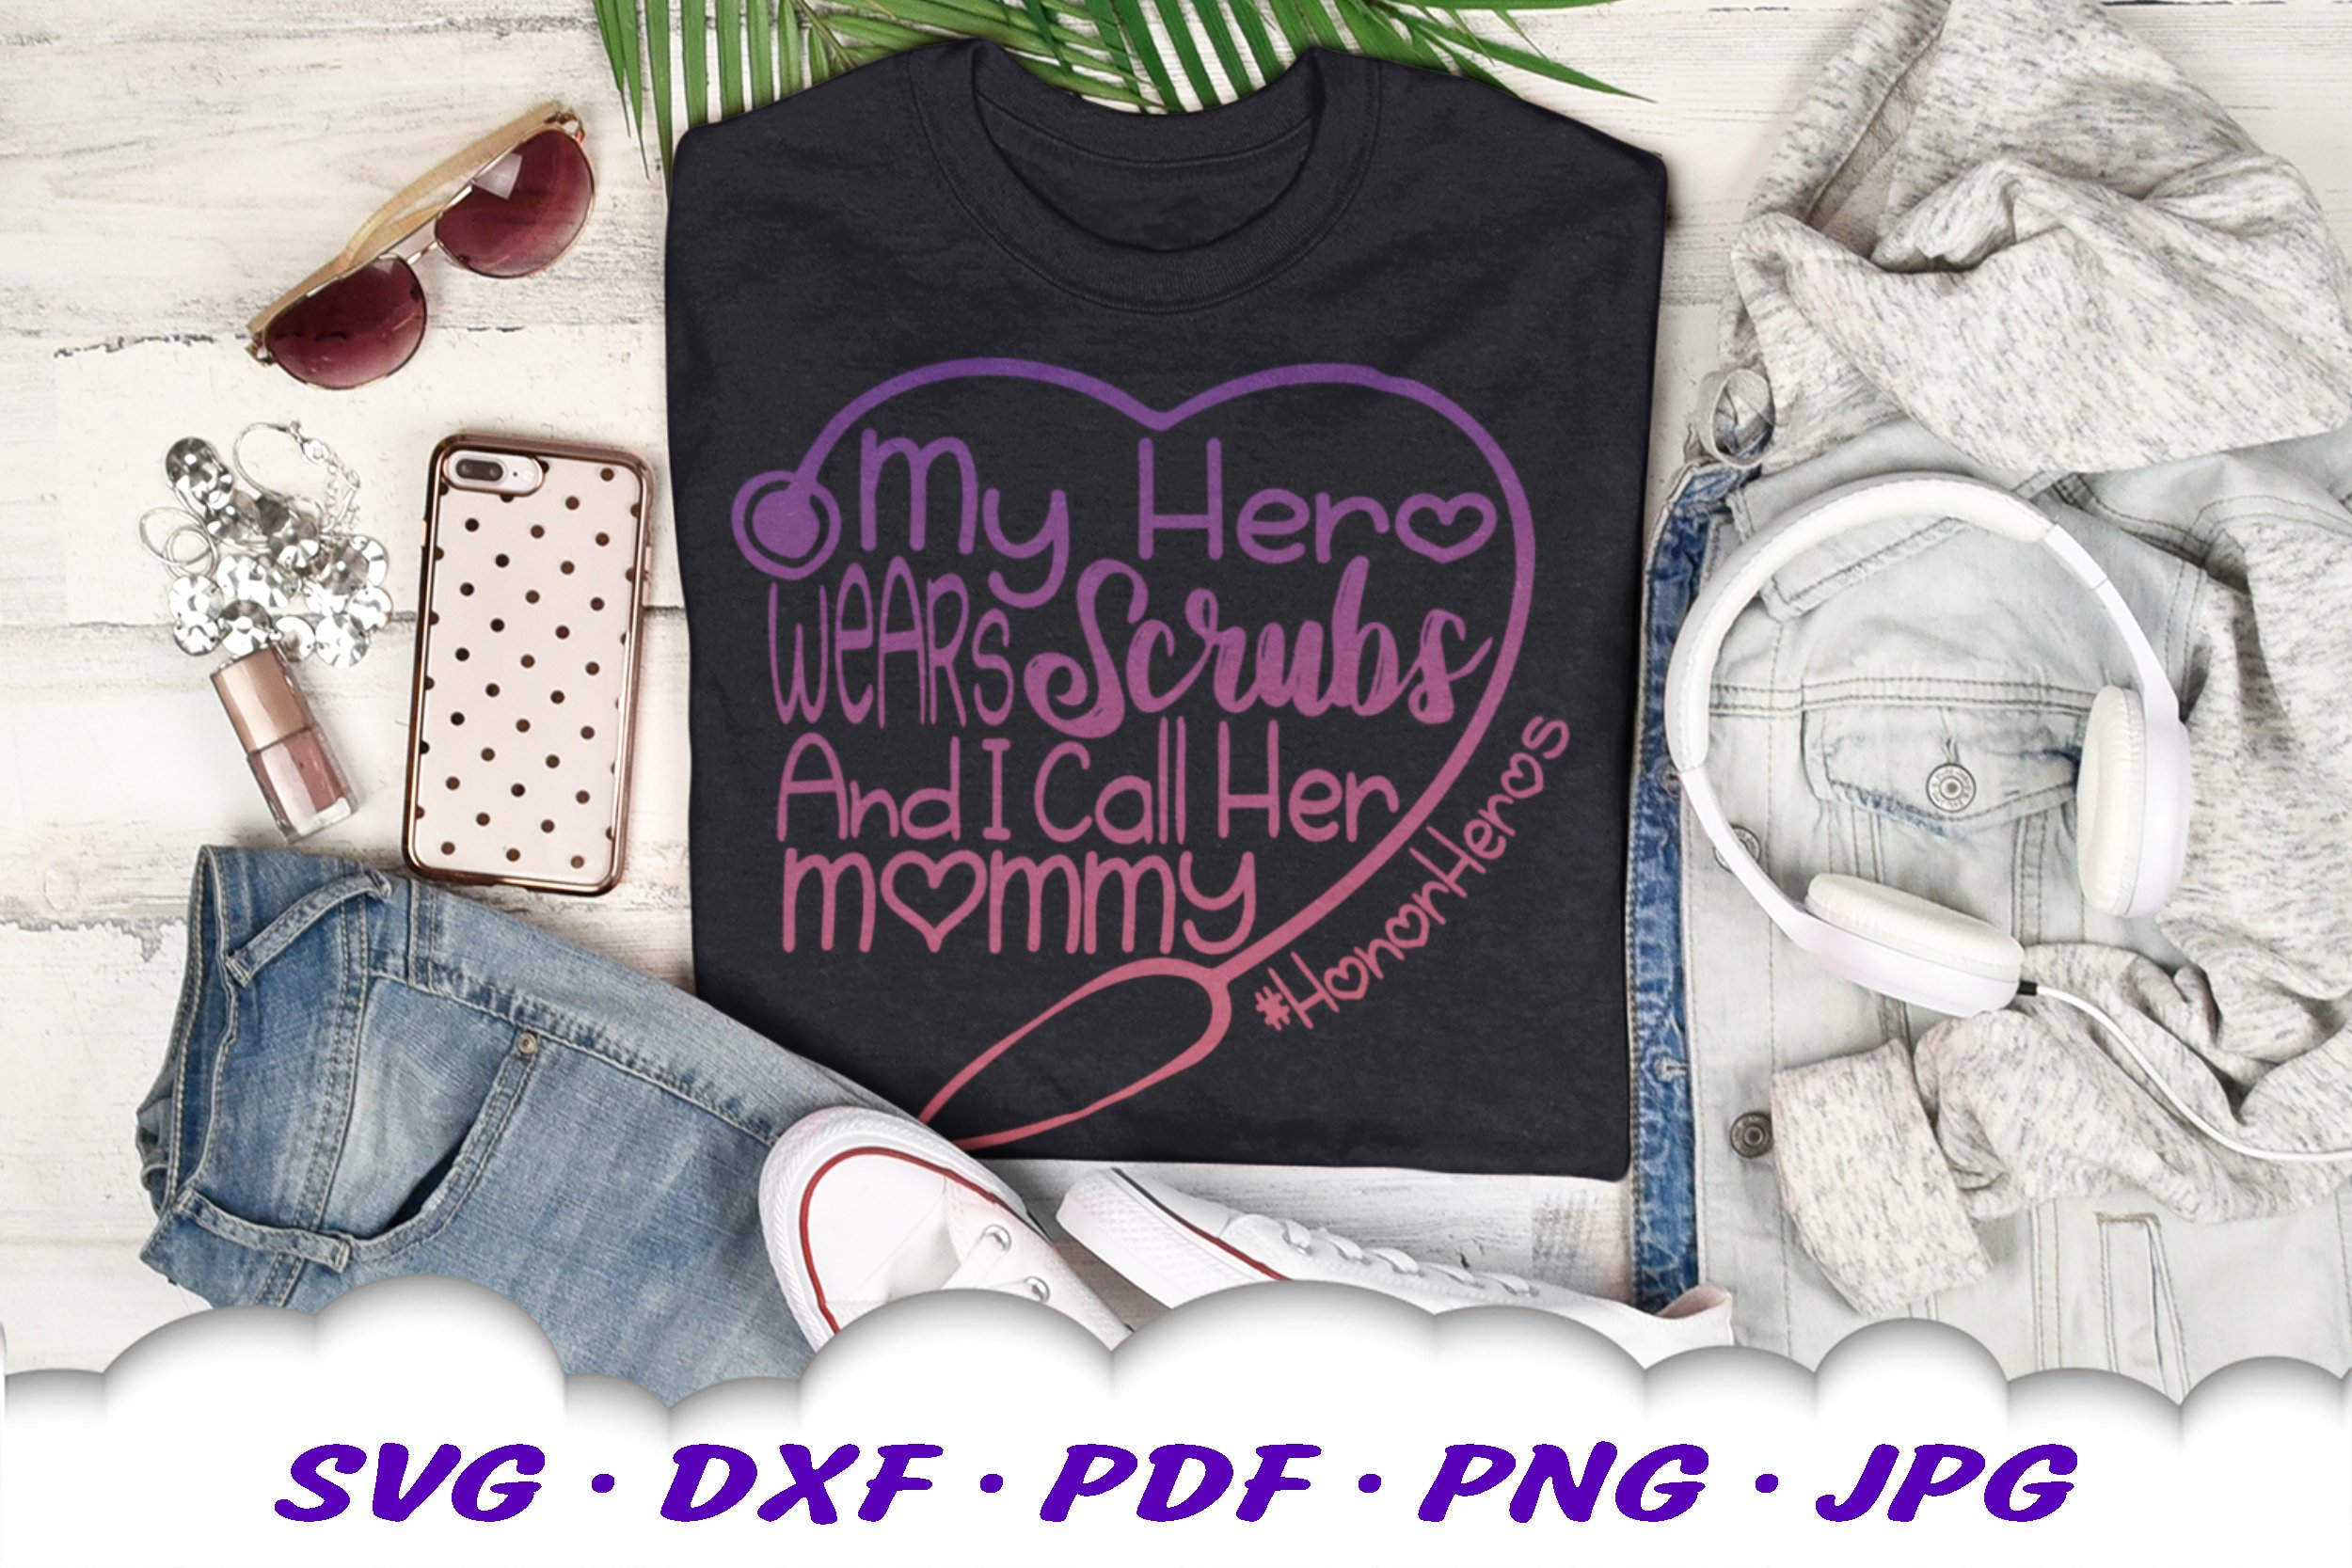 My Hero Scrubs Nurse Mom Stethoscope SVG DXF Cut Files example image 3